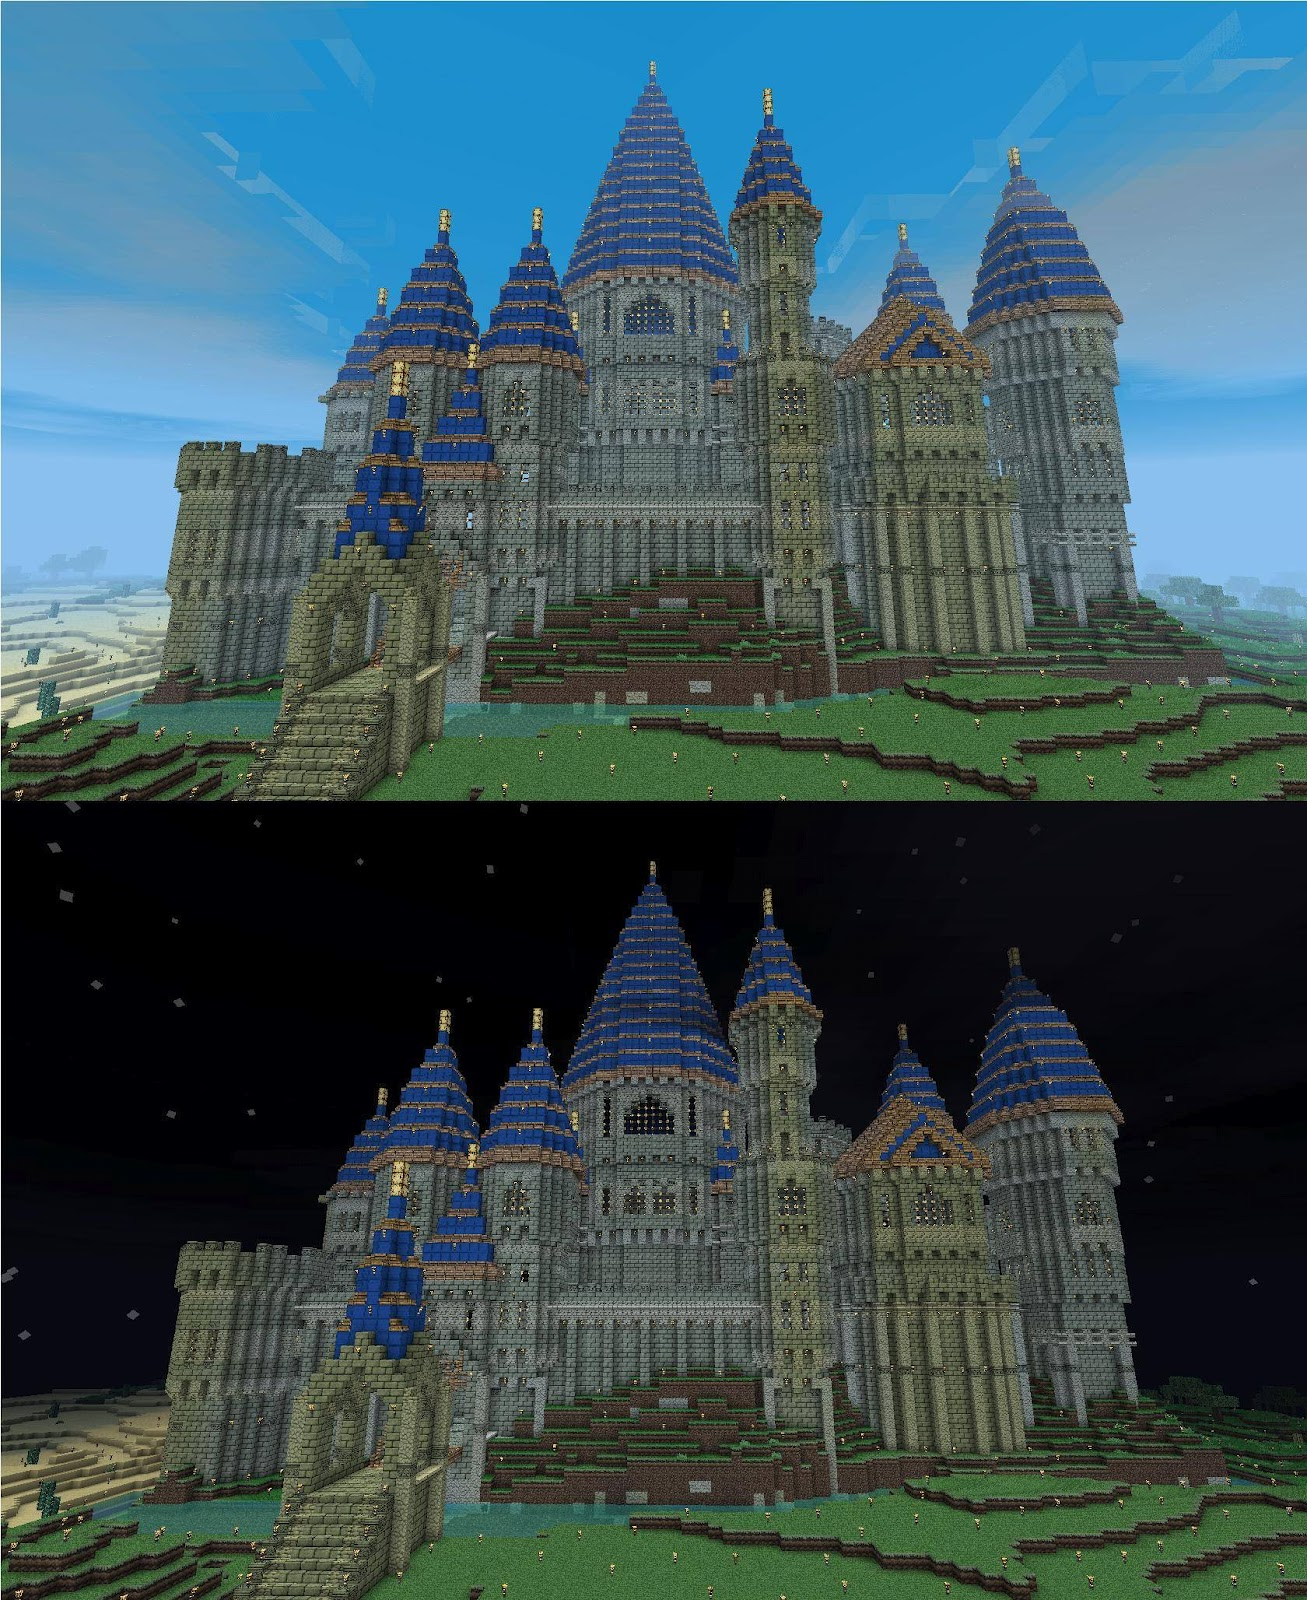 The Minecraft Castle: Enormous Colourful Minecraft Castle